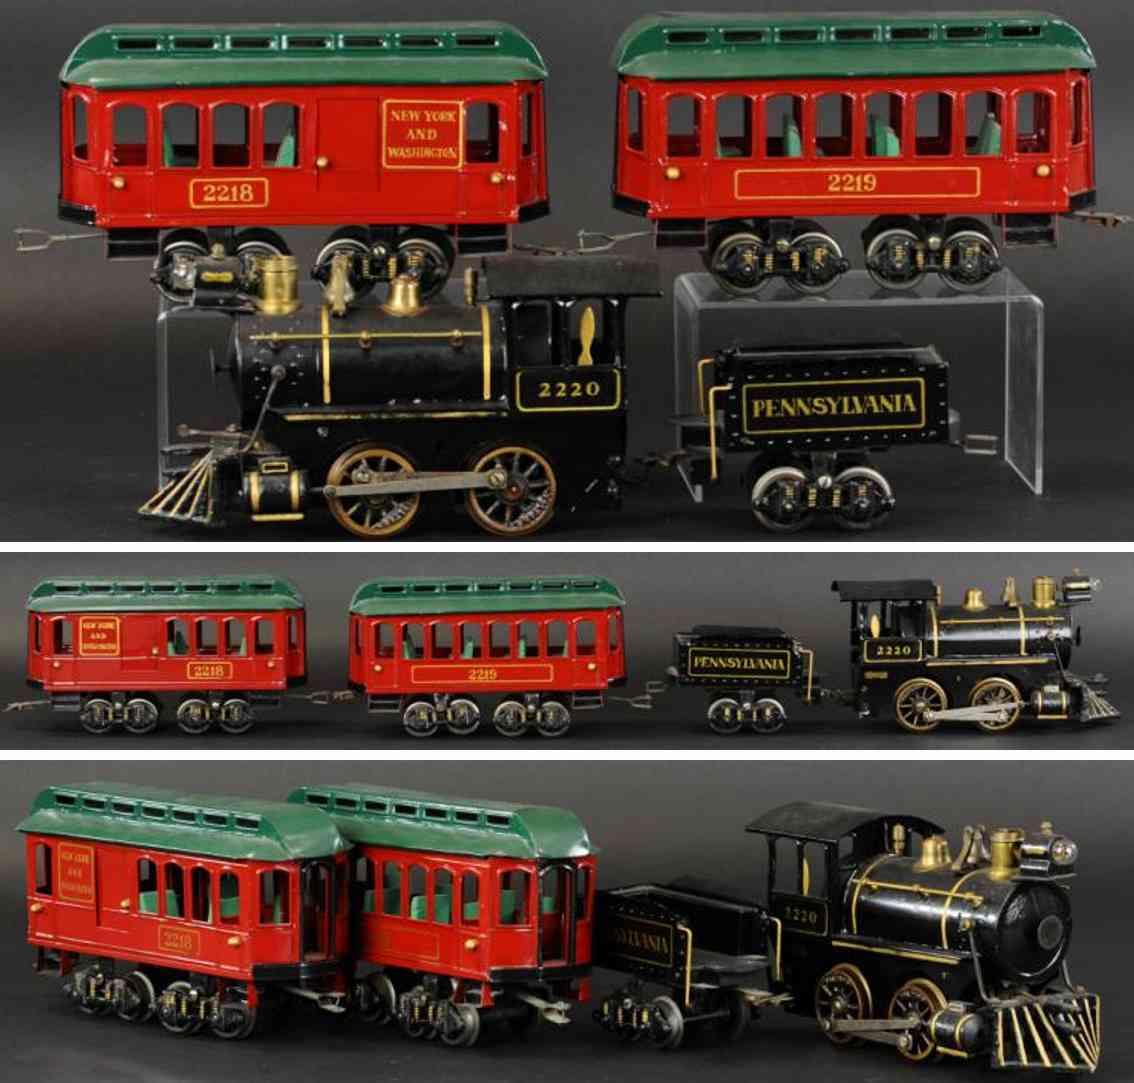 voltamp lok 2200 wagen 2218 2219 personenzug standard gauge